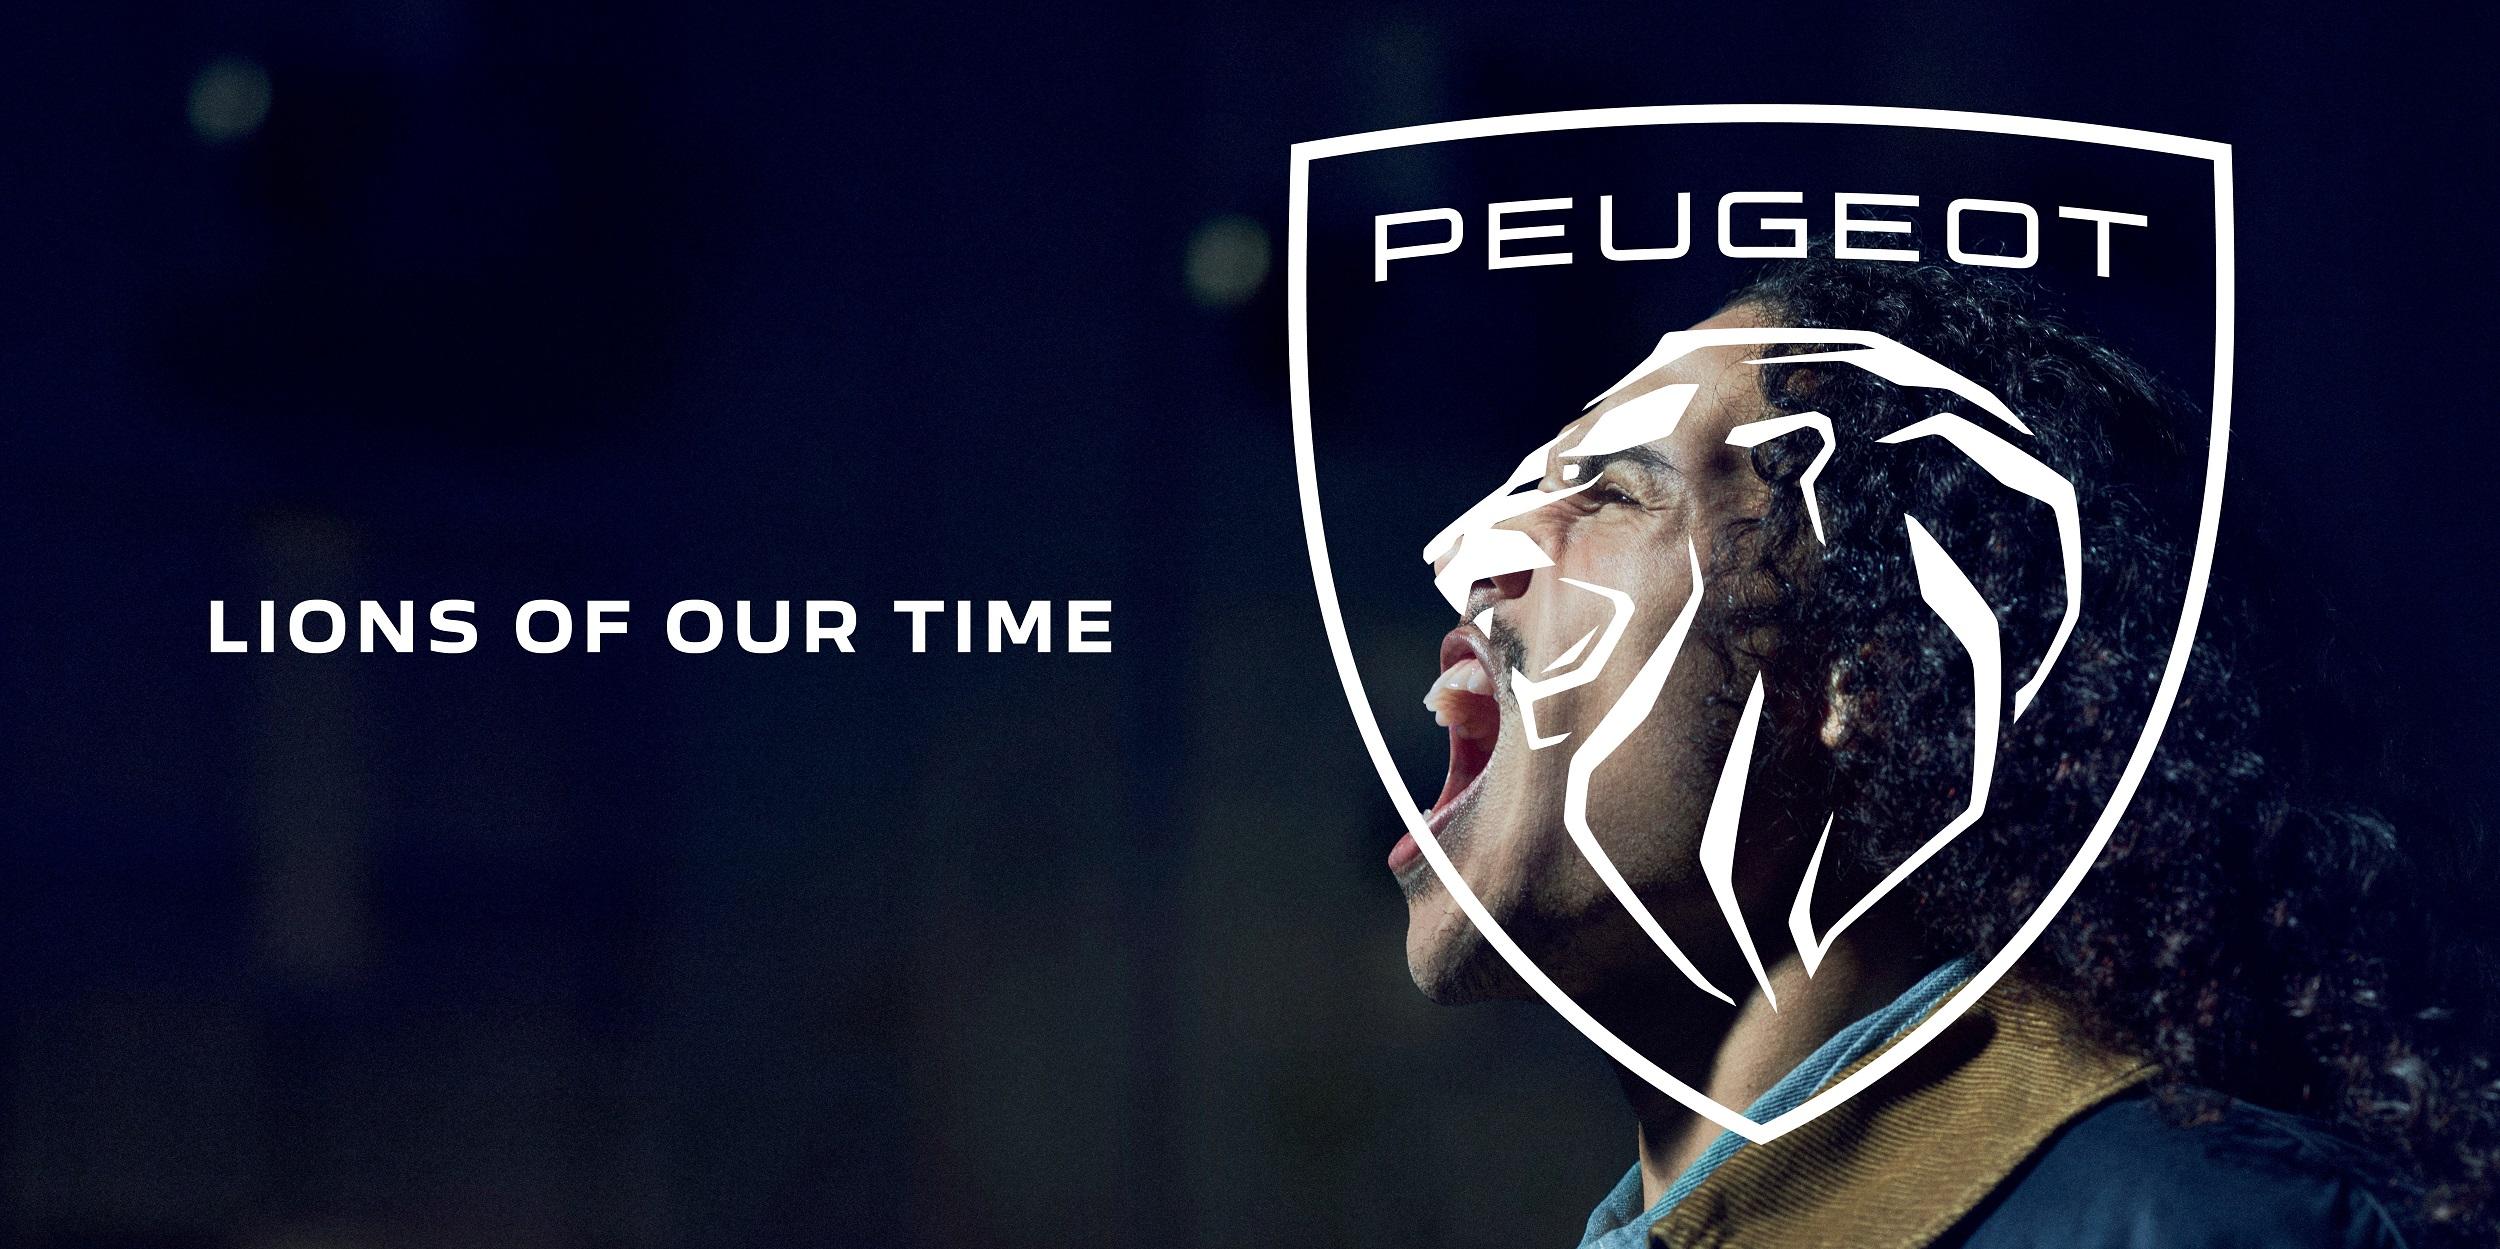 Nova Logomarca Da Peugeot 2021 (1)